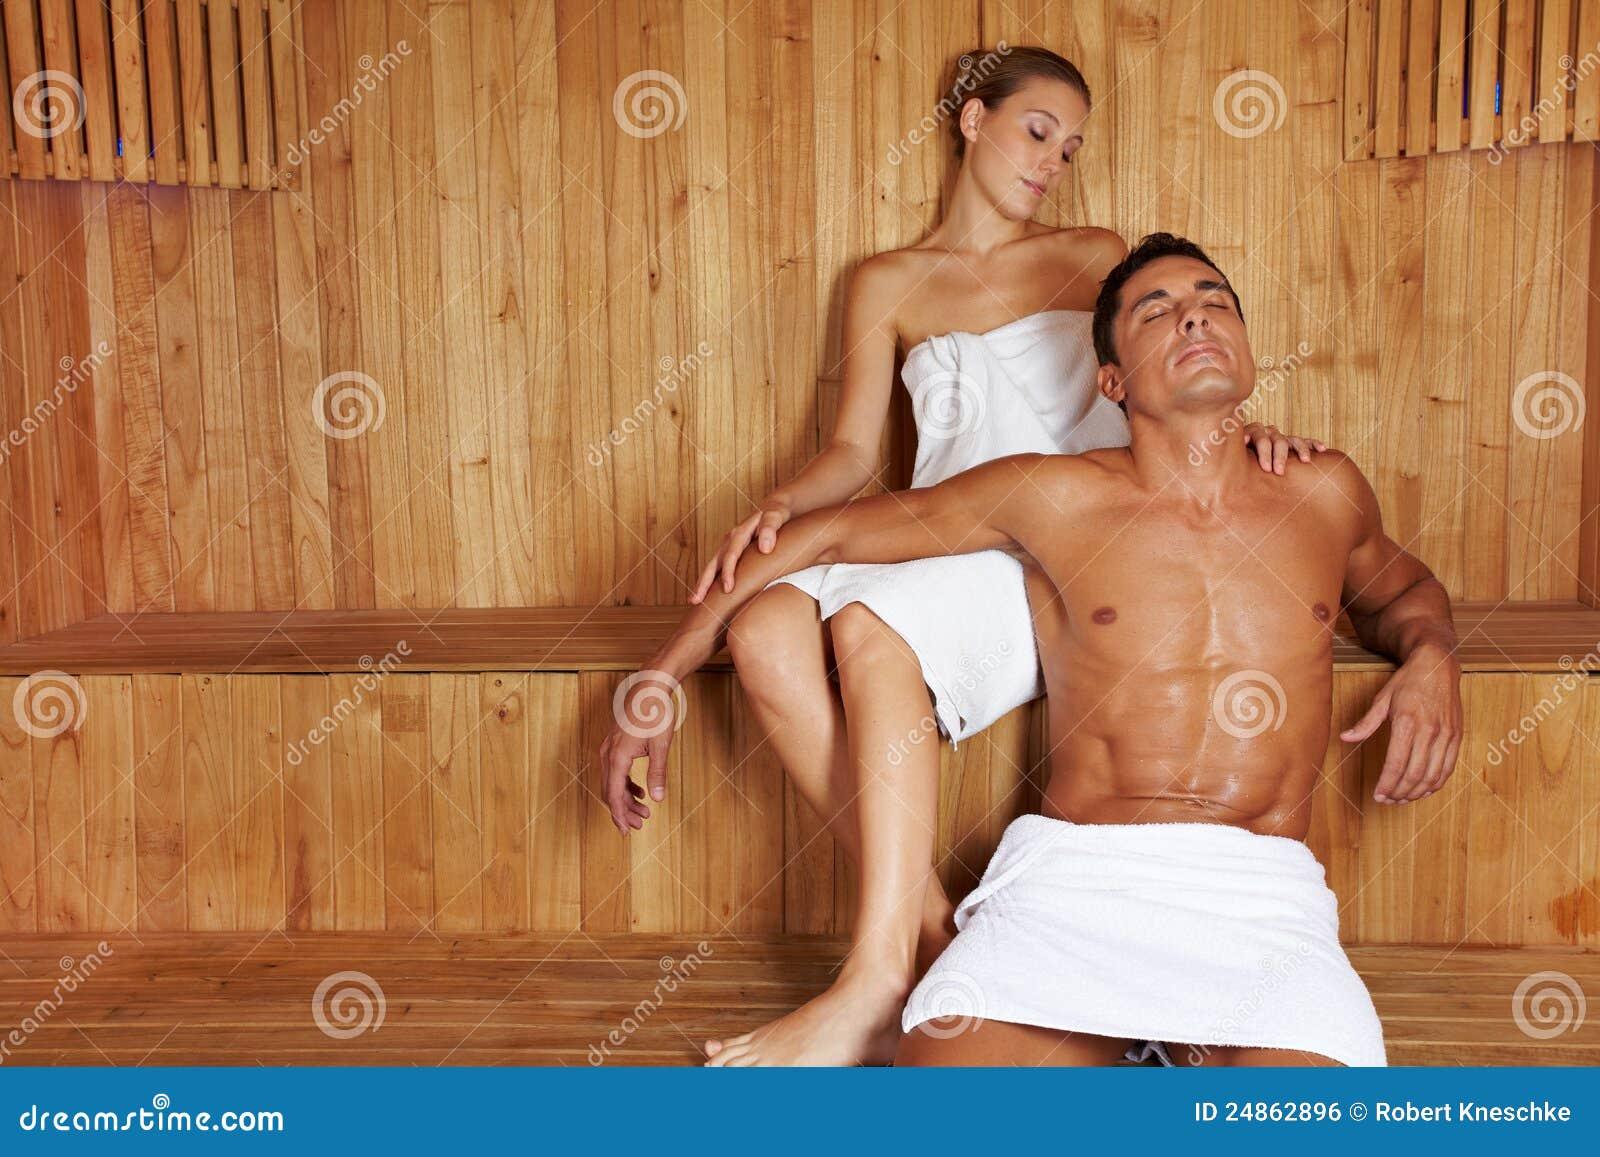 2 frauen im whirlpool porno